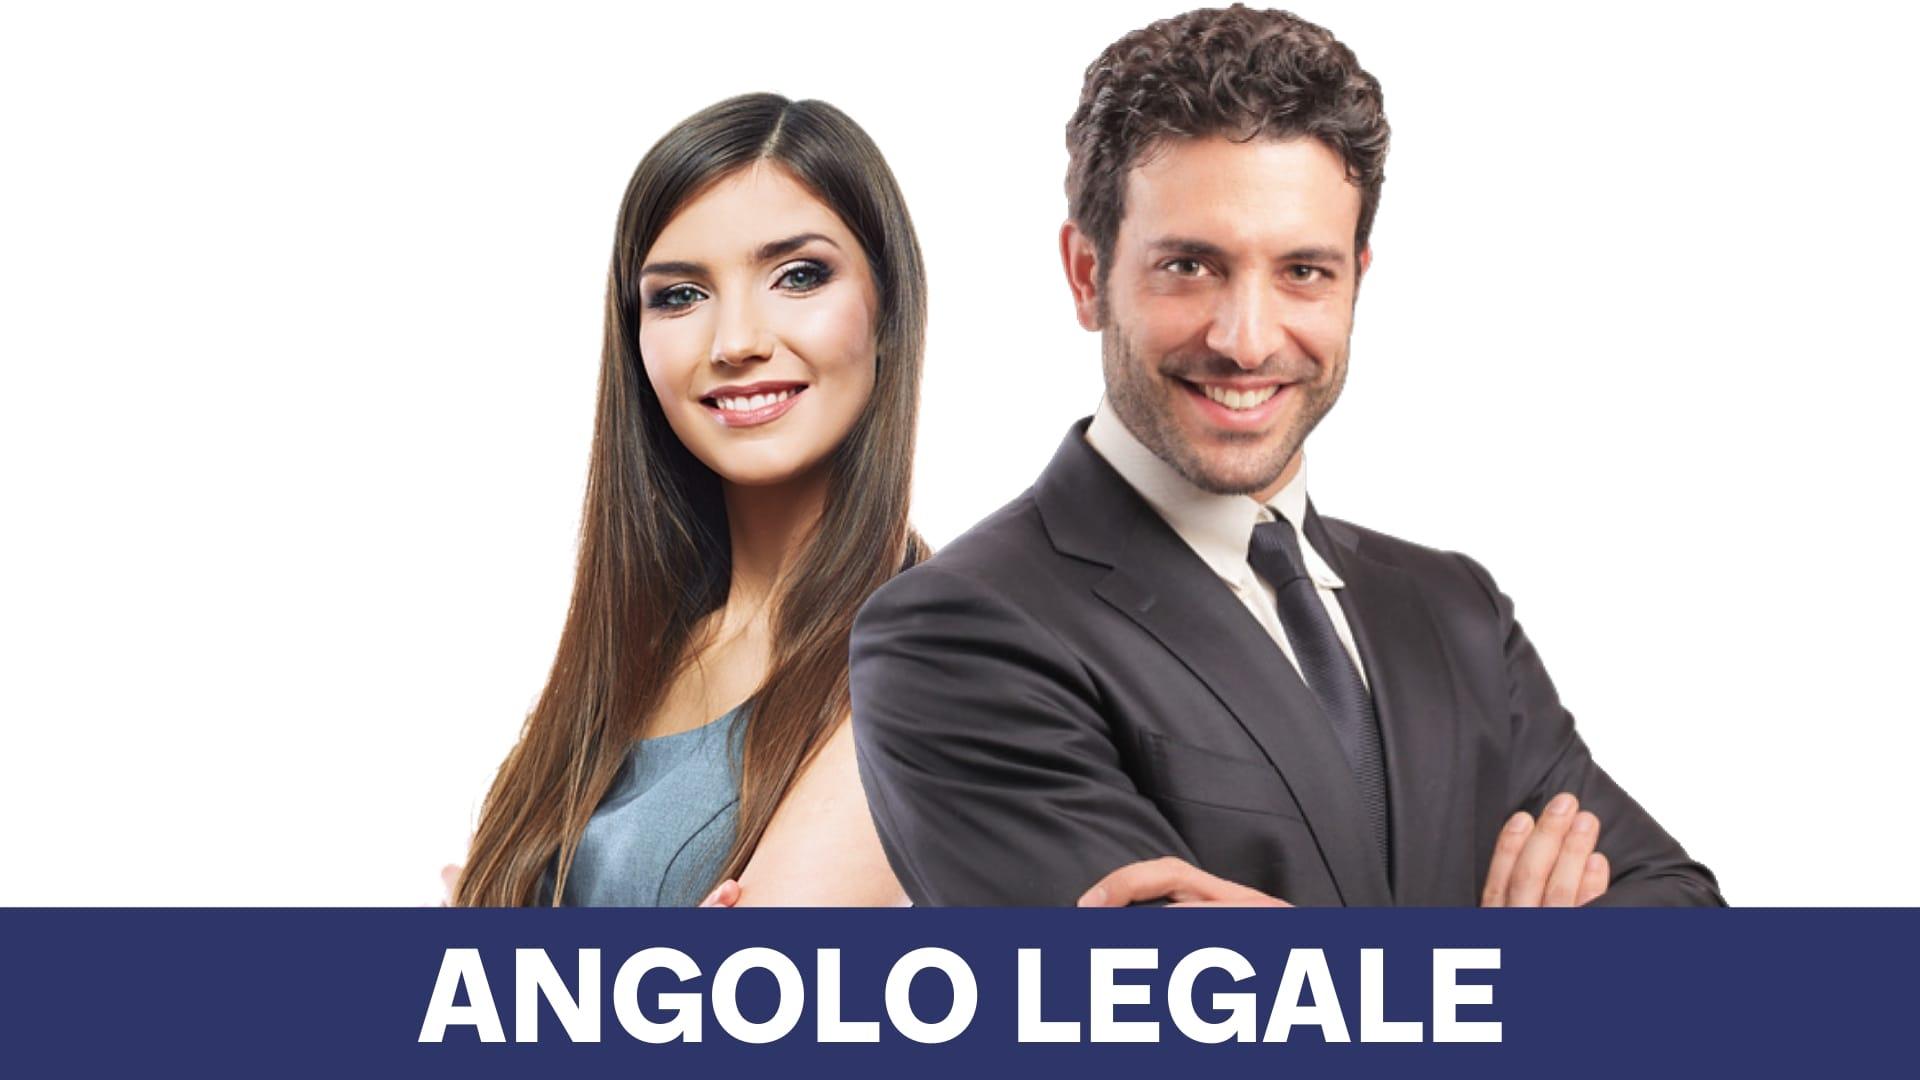 Angolo Legale FIAP  v19